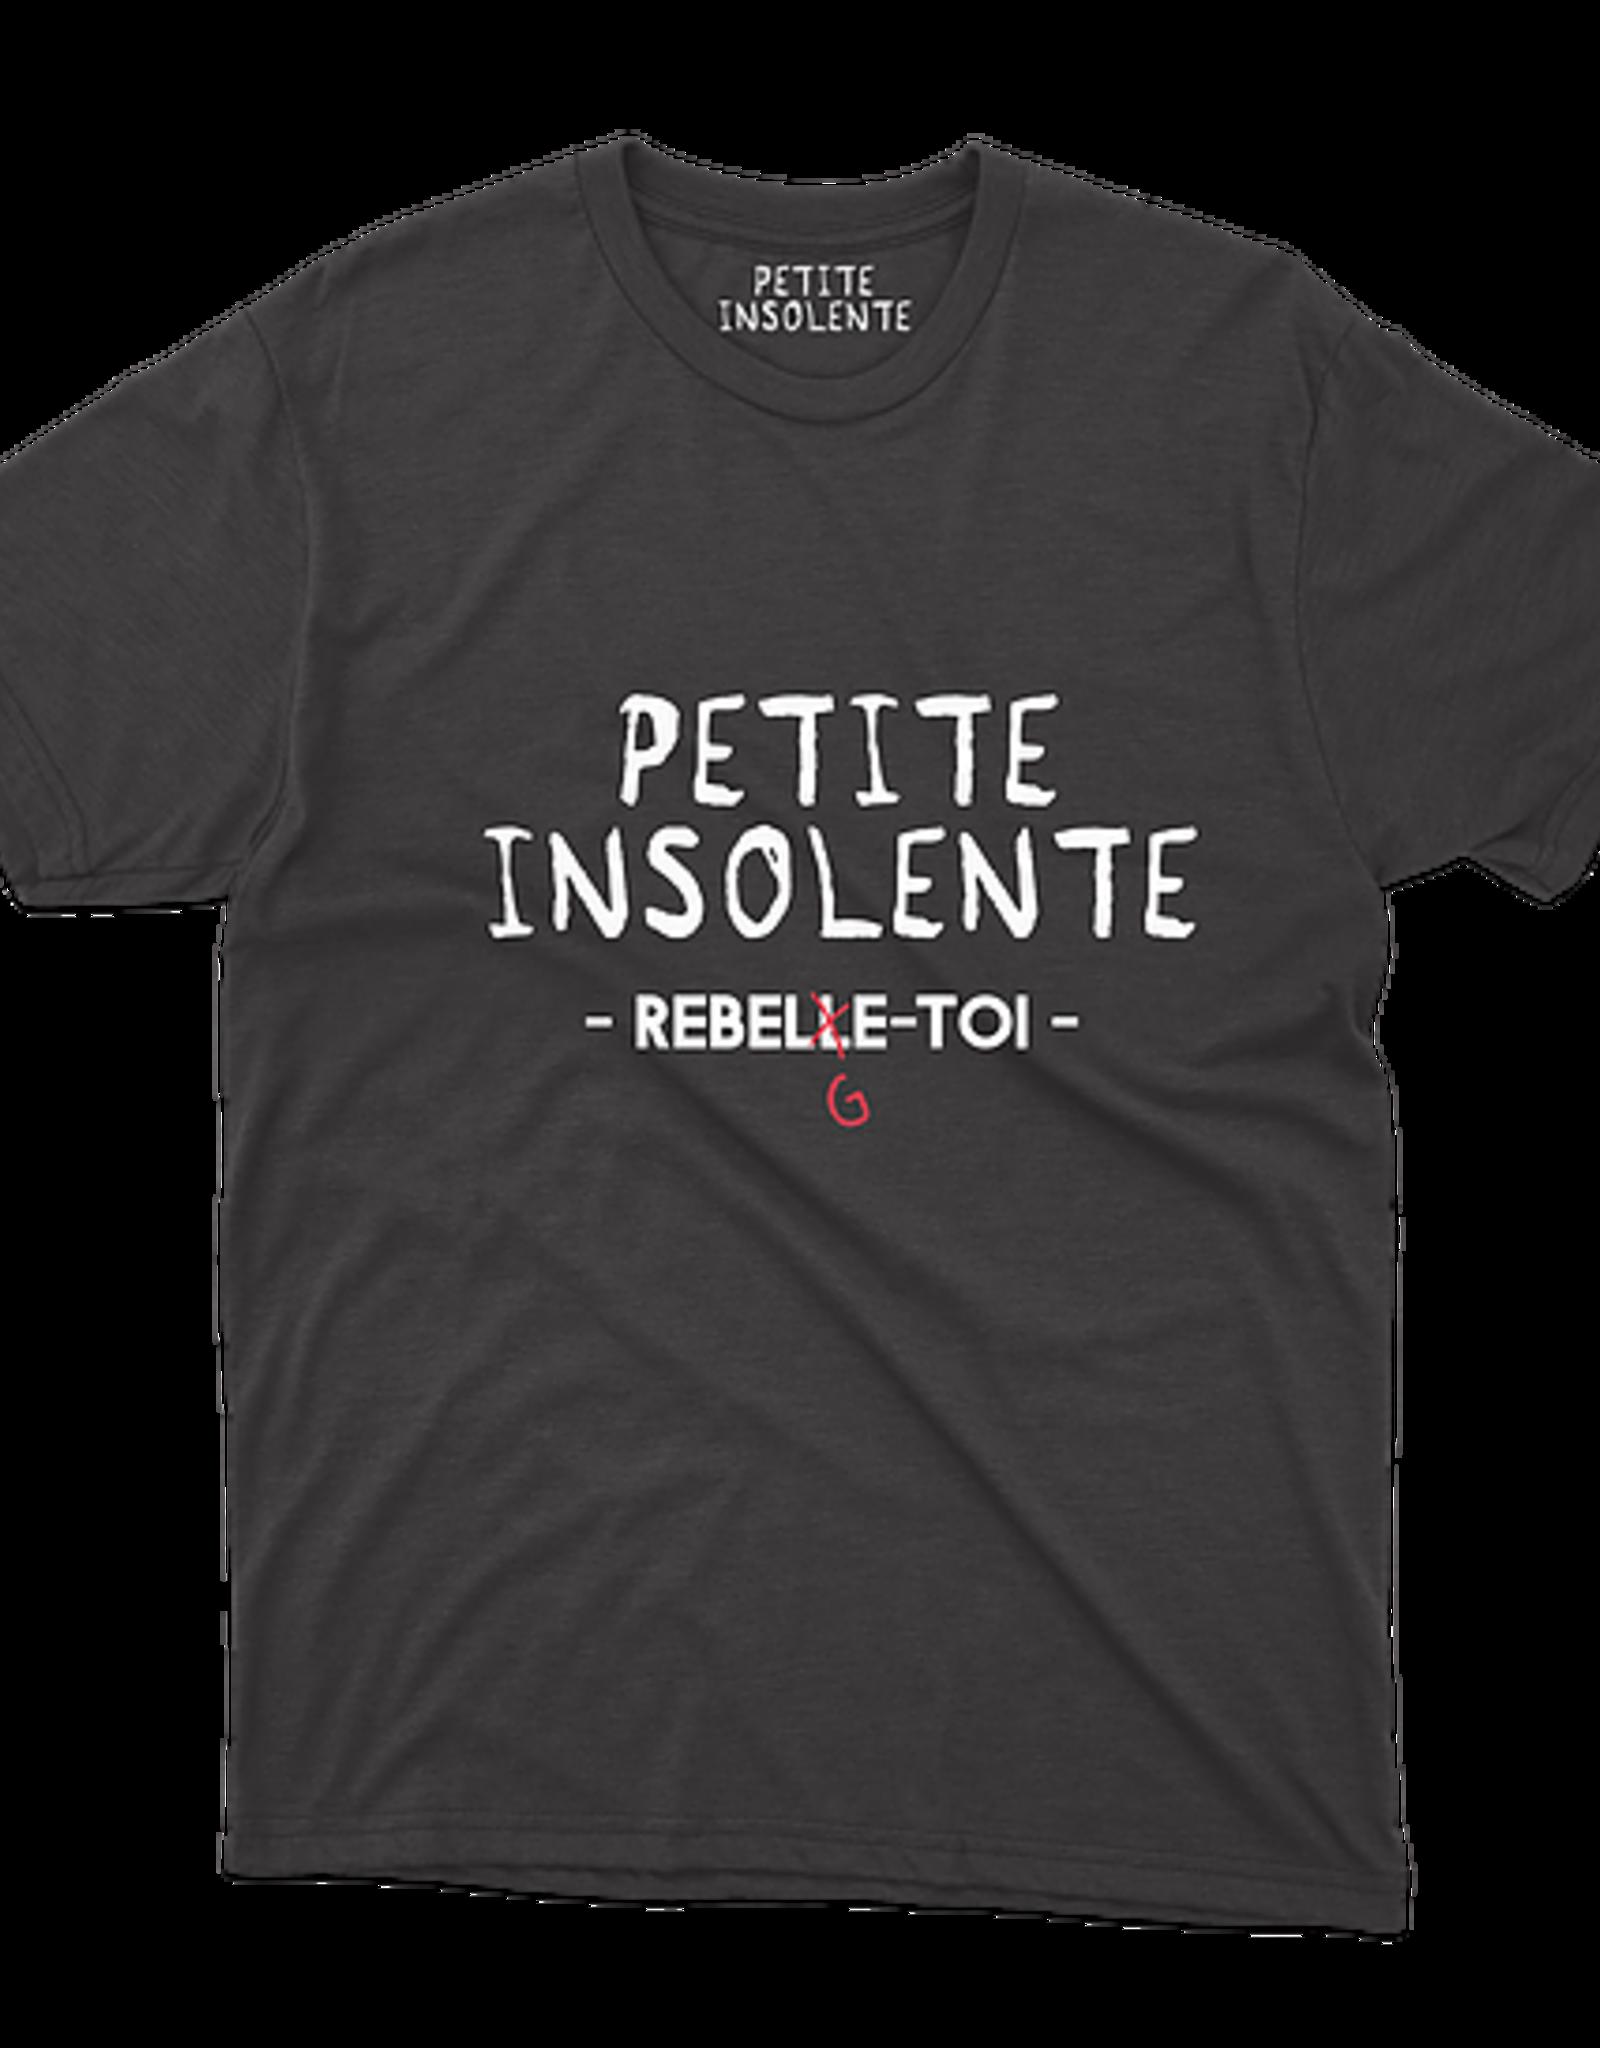 "Petite Insolente Tee shirt "" Petite insolente ReBelge toi"" Noir"